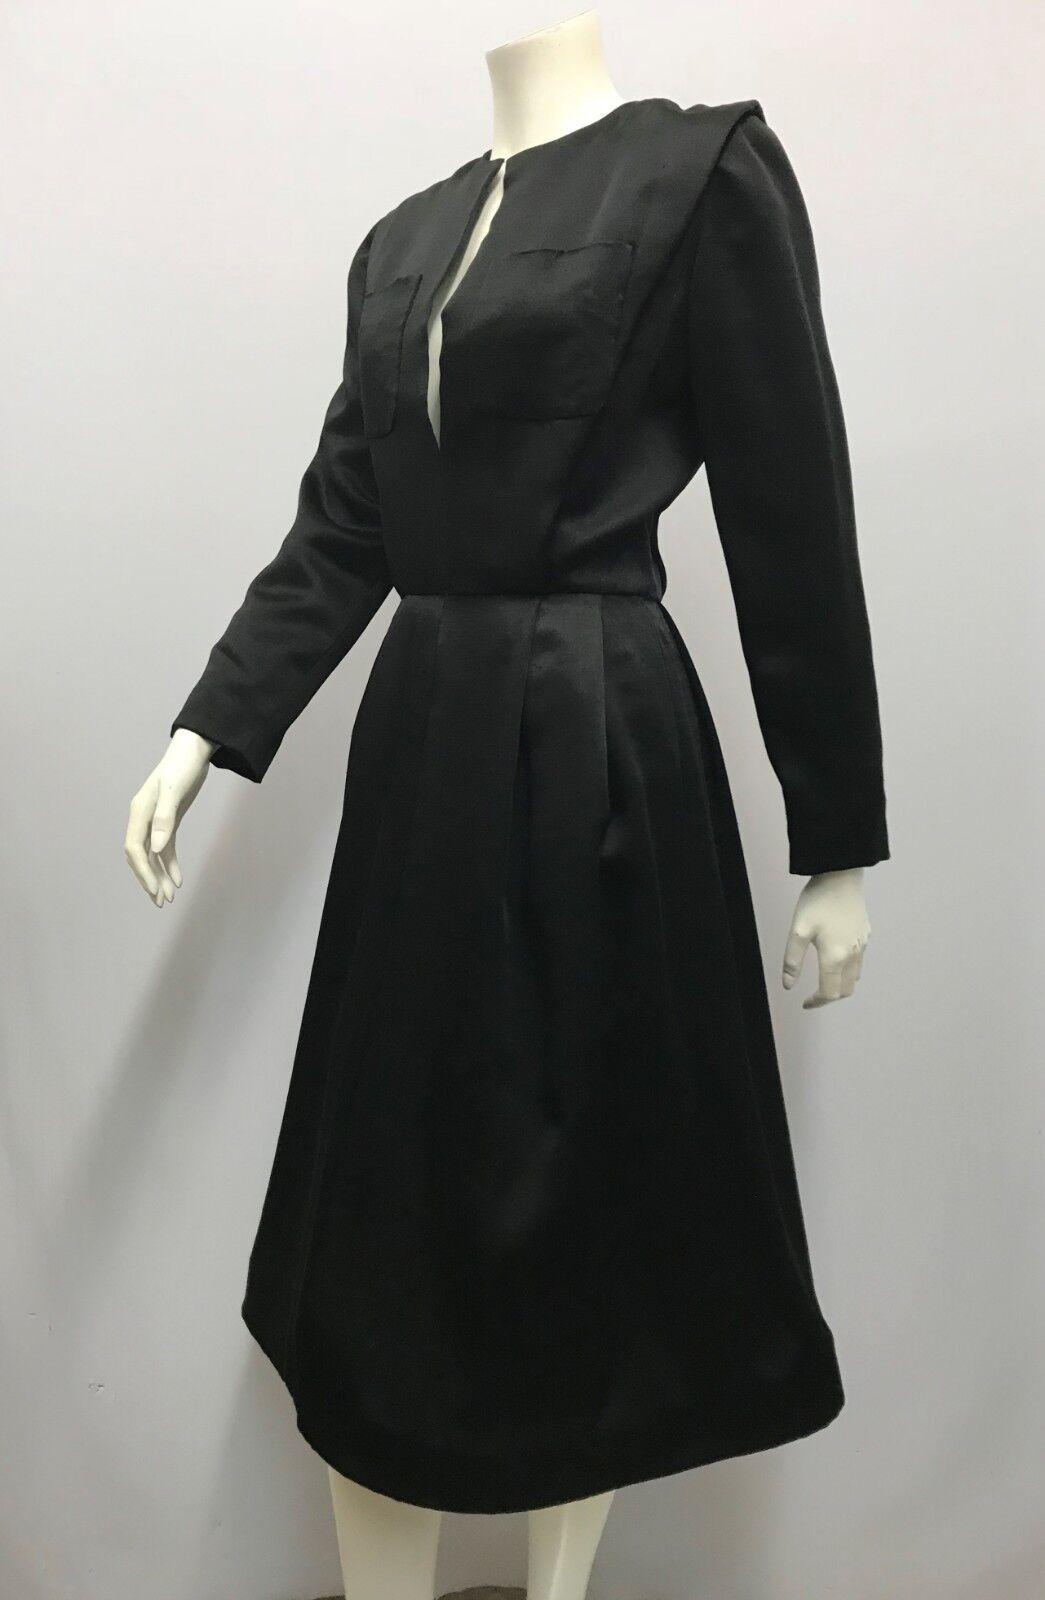 VINTAGE SCAASI BOUTIQUE DRESS COCKTAIL DRESS BLAC… - image 2